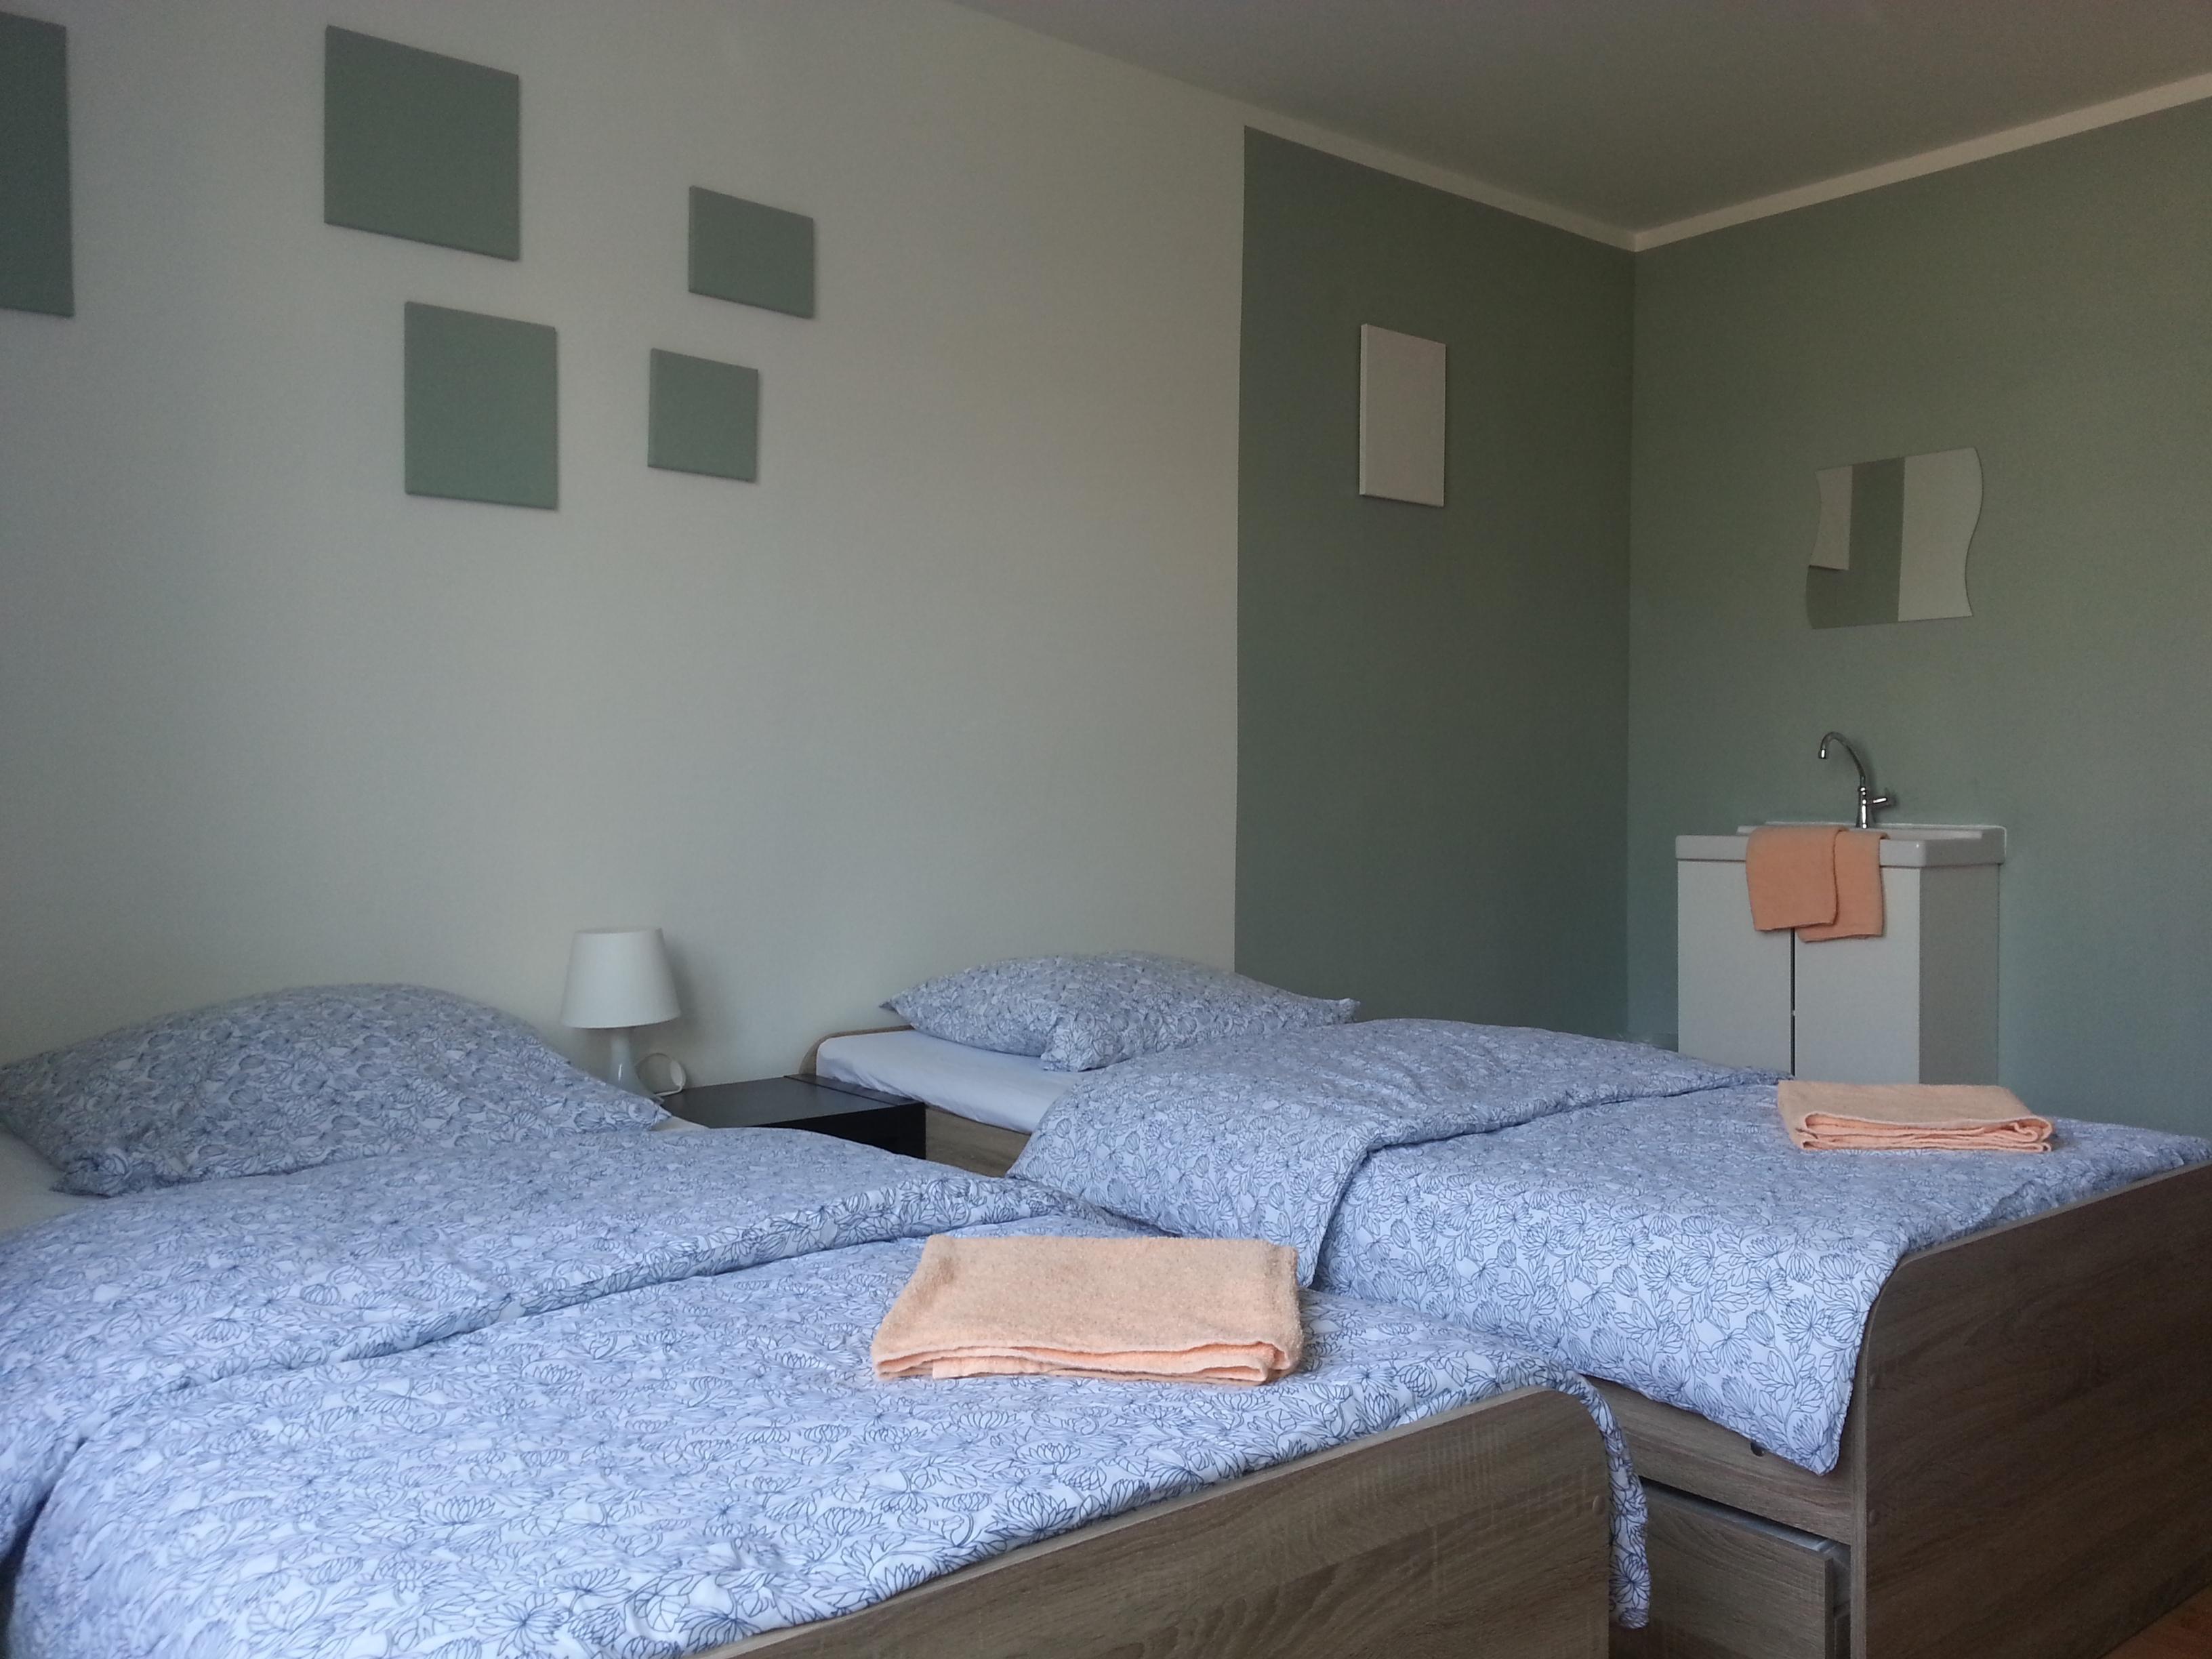 g nstige hotels in leipzig buchen. Black Bedroom Furniture Sets. Home Design Ideas